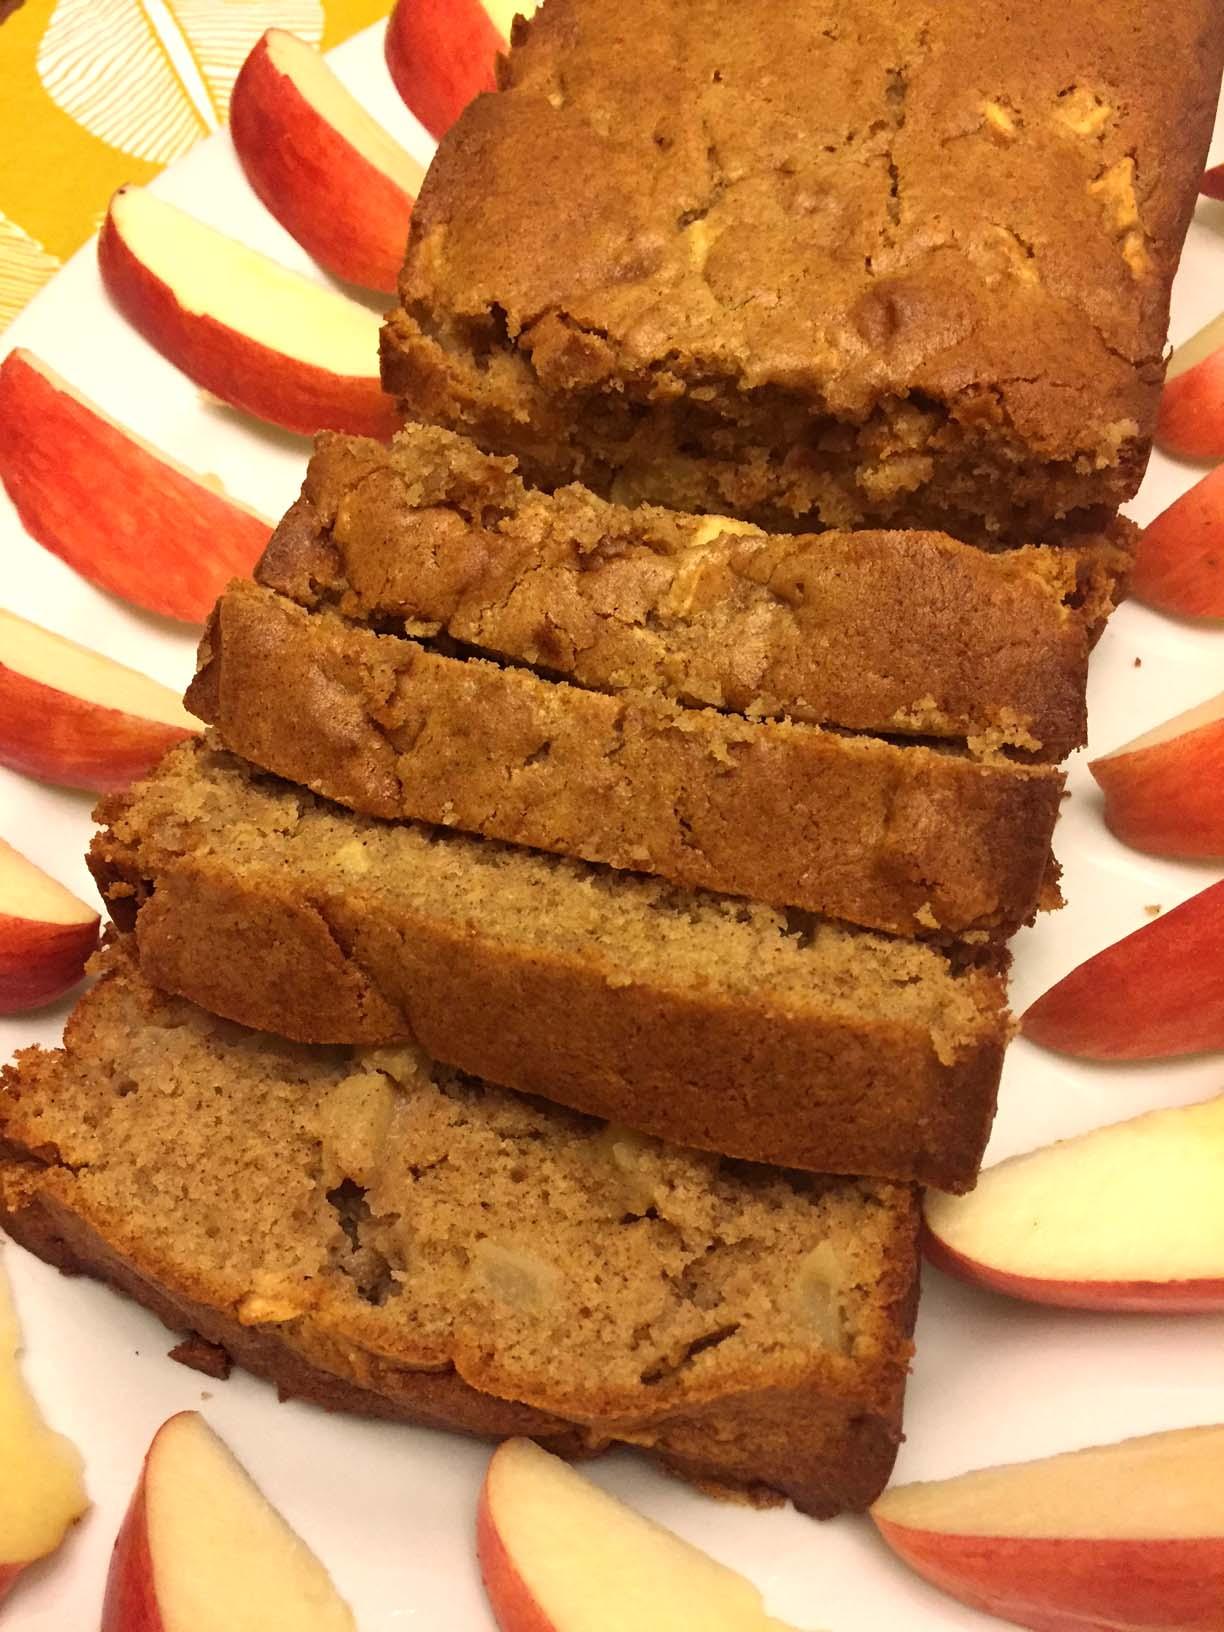 Instant Pot Apple Dessert Recipes